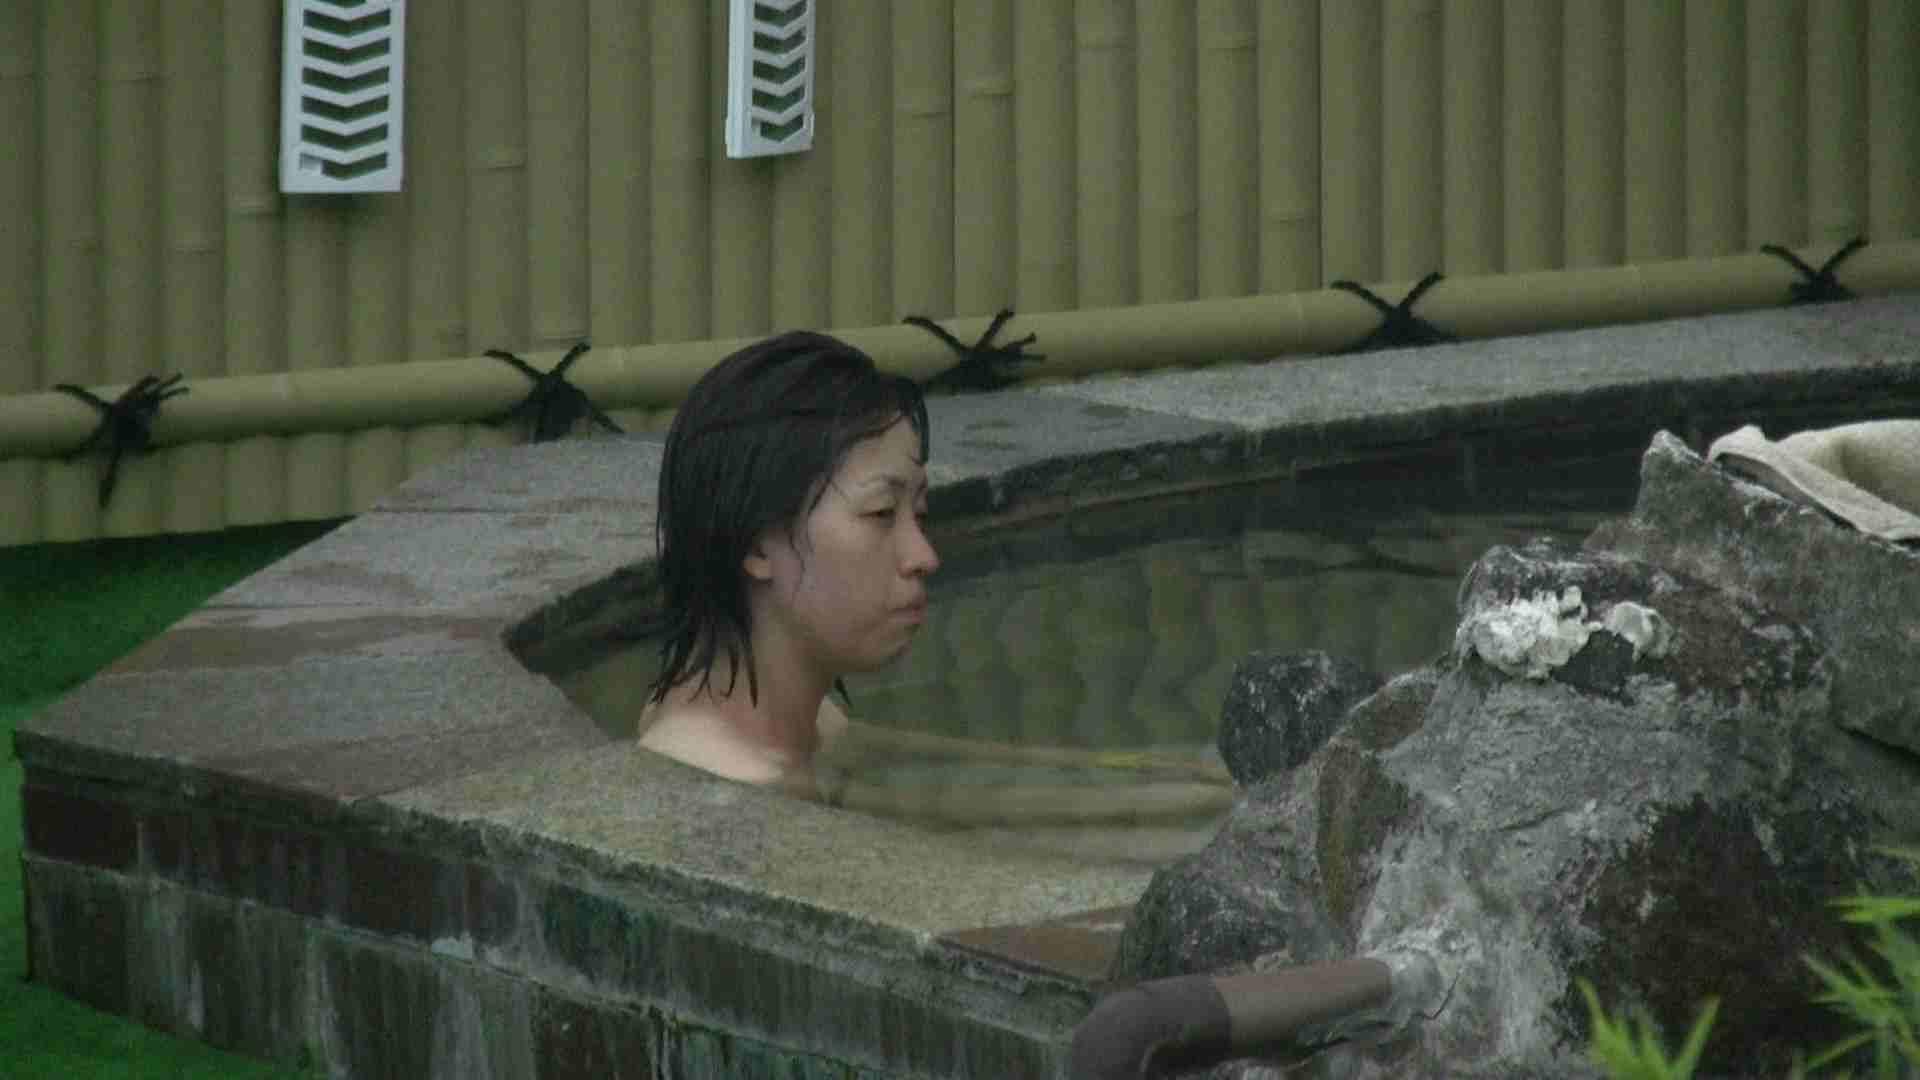 Aquaな露天風呂Vol.170 0   いやらしいOL  65連発 5